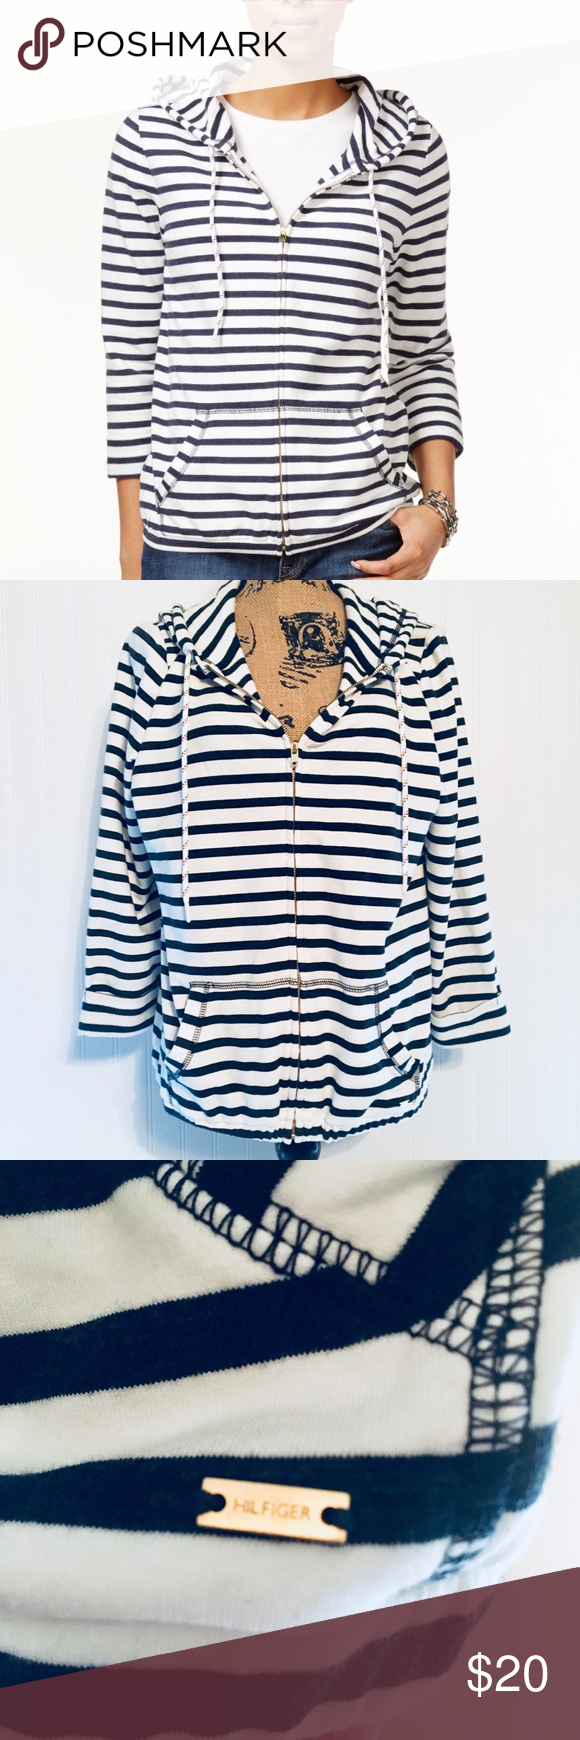 Sale 3/30 Tommy Hilfiger zip hoodie. Large Tommy